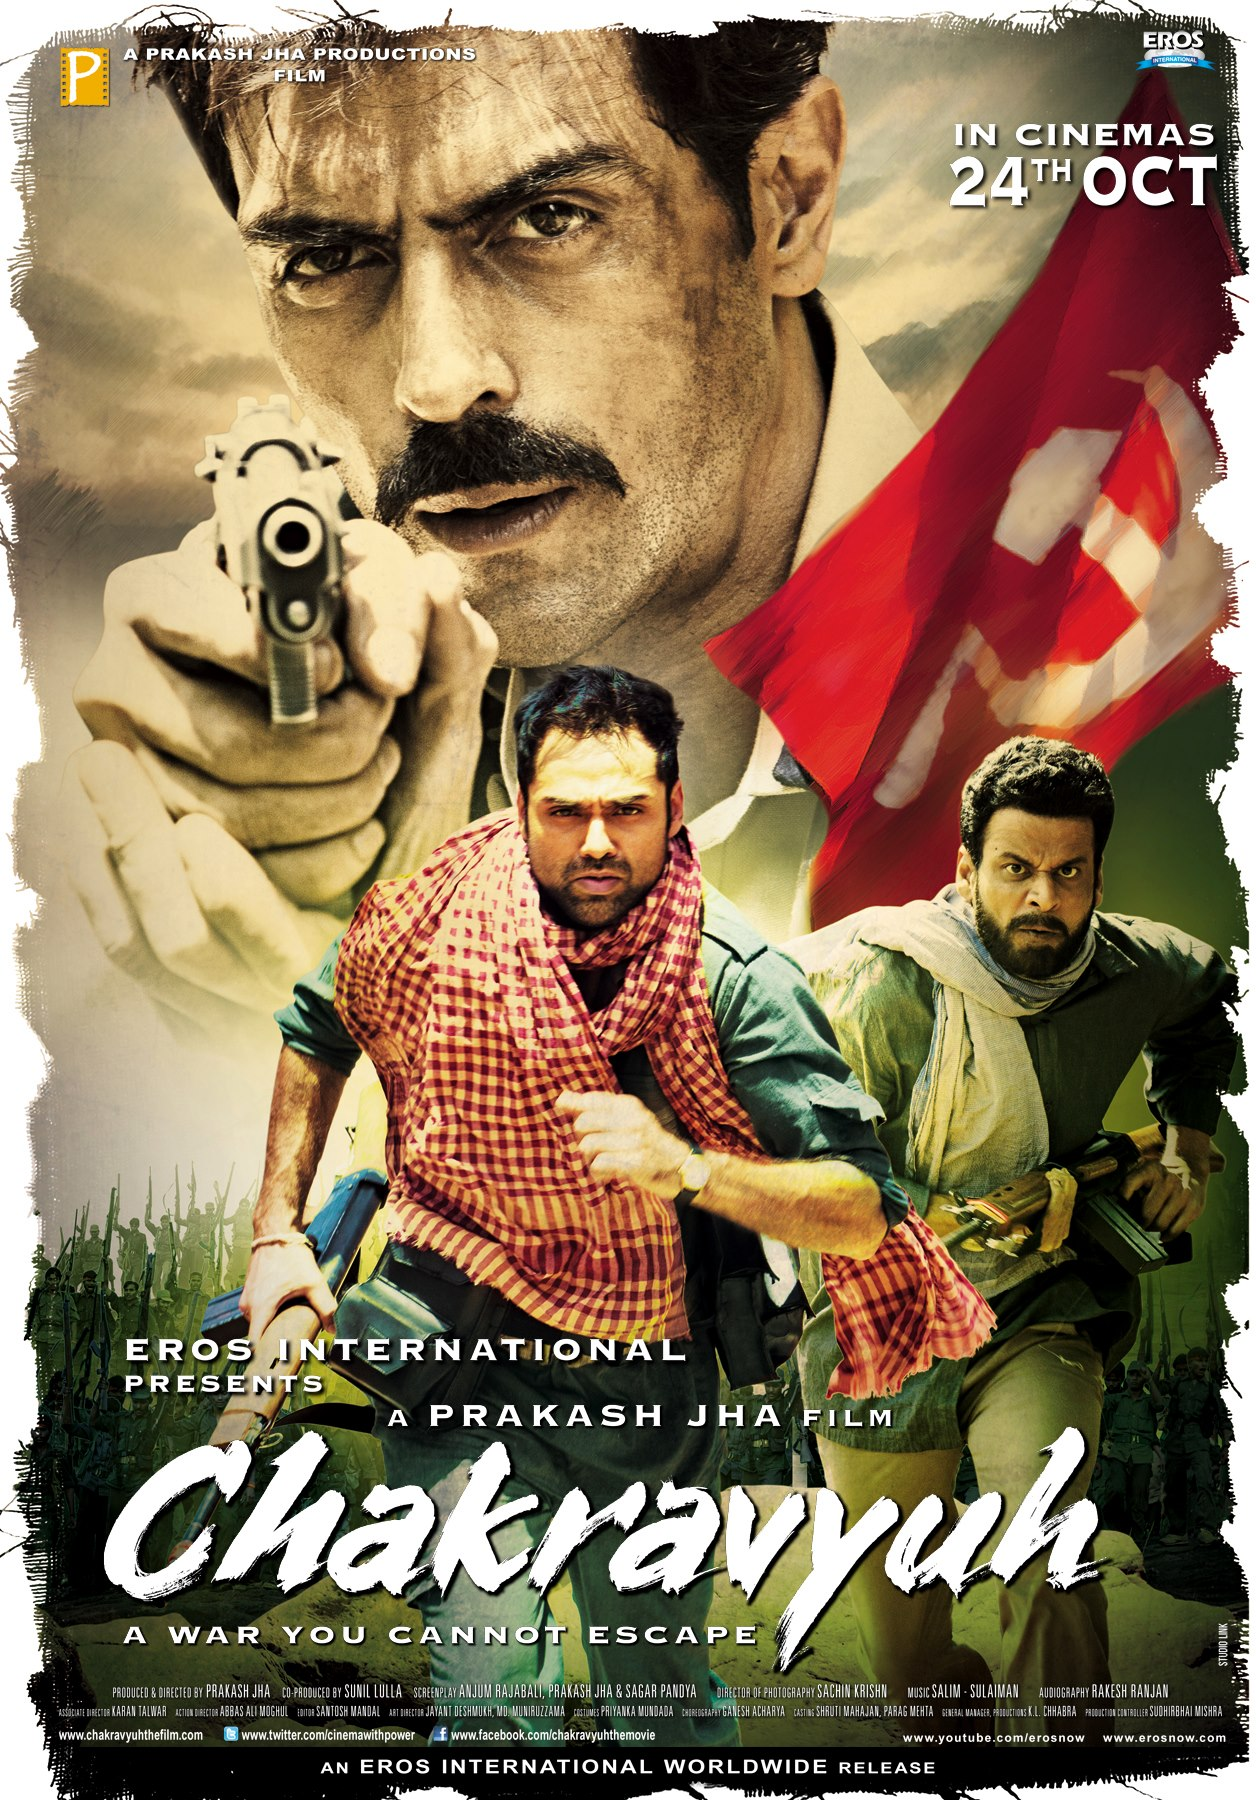 chakravyuh (2012) hindi movie online watch full length hd